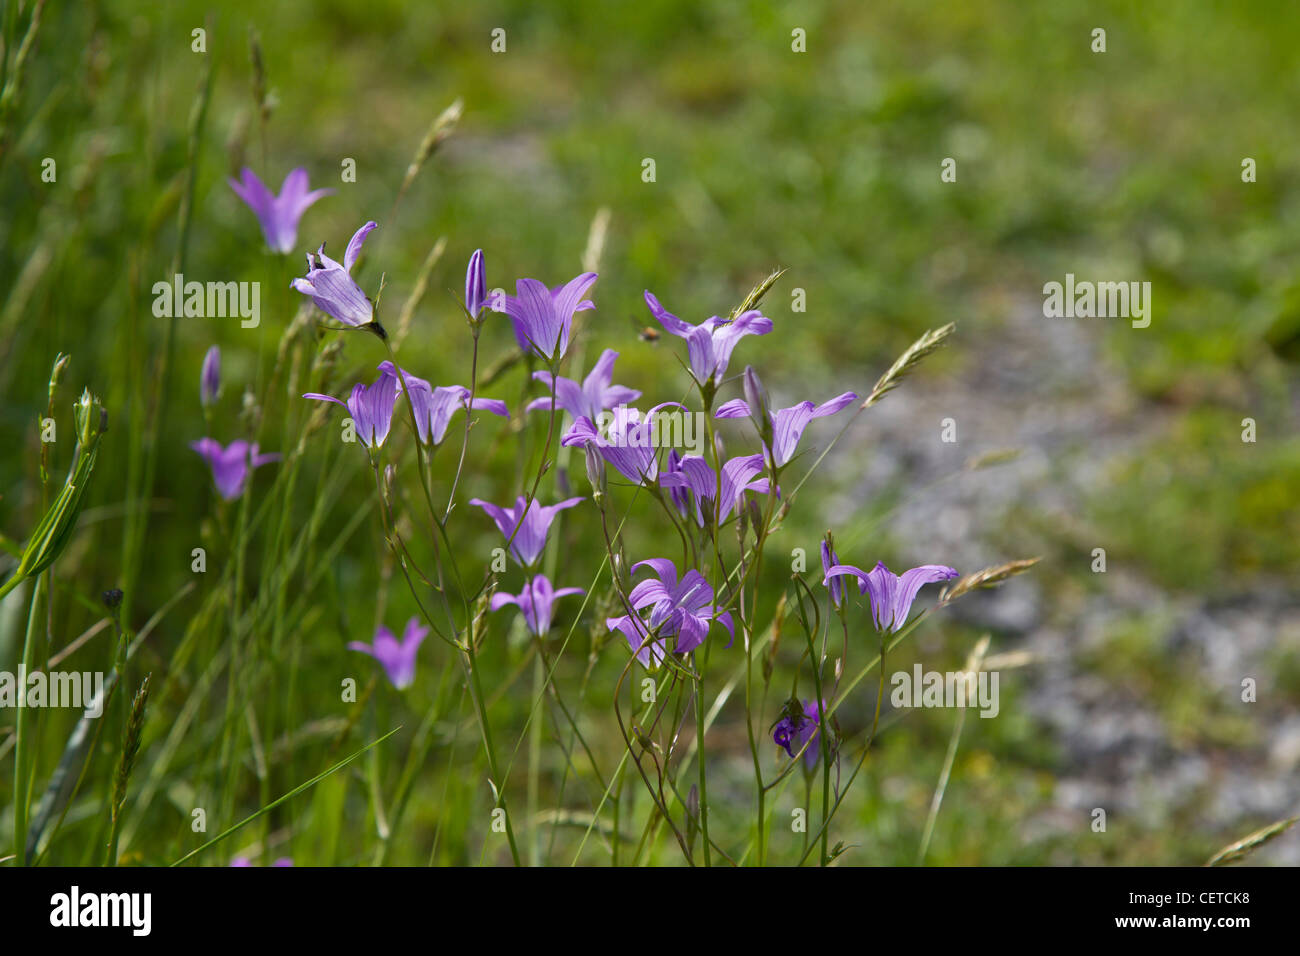 Glockenblume - Stock Image